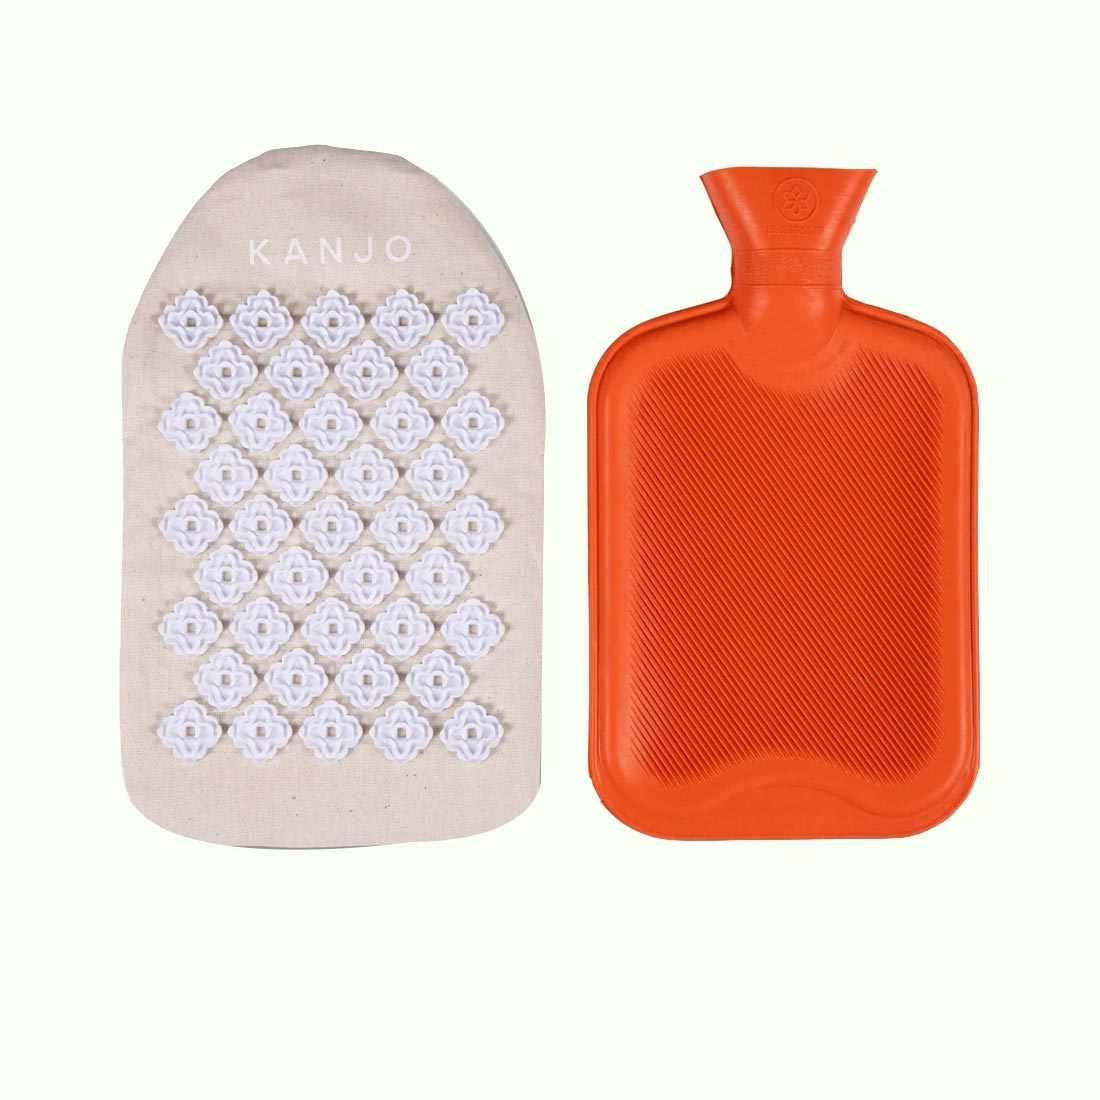 Acutens Kanjo Hot Water Bottle Acupressure Pillow